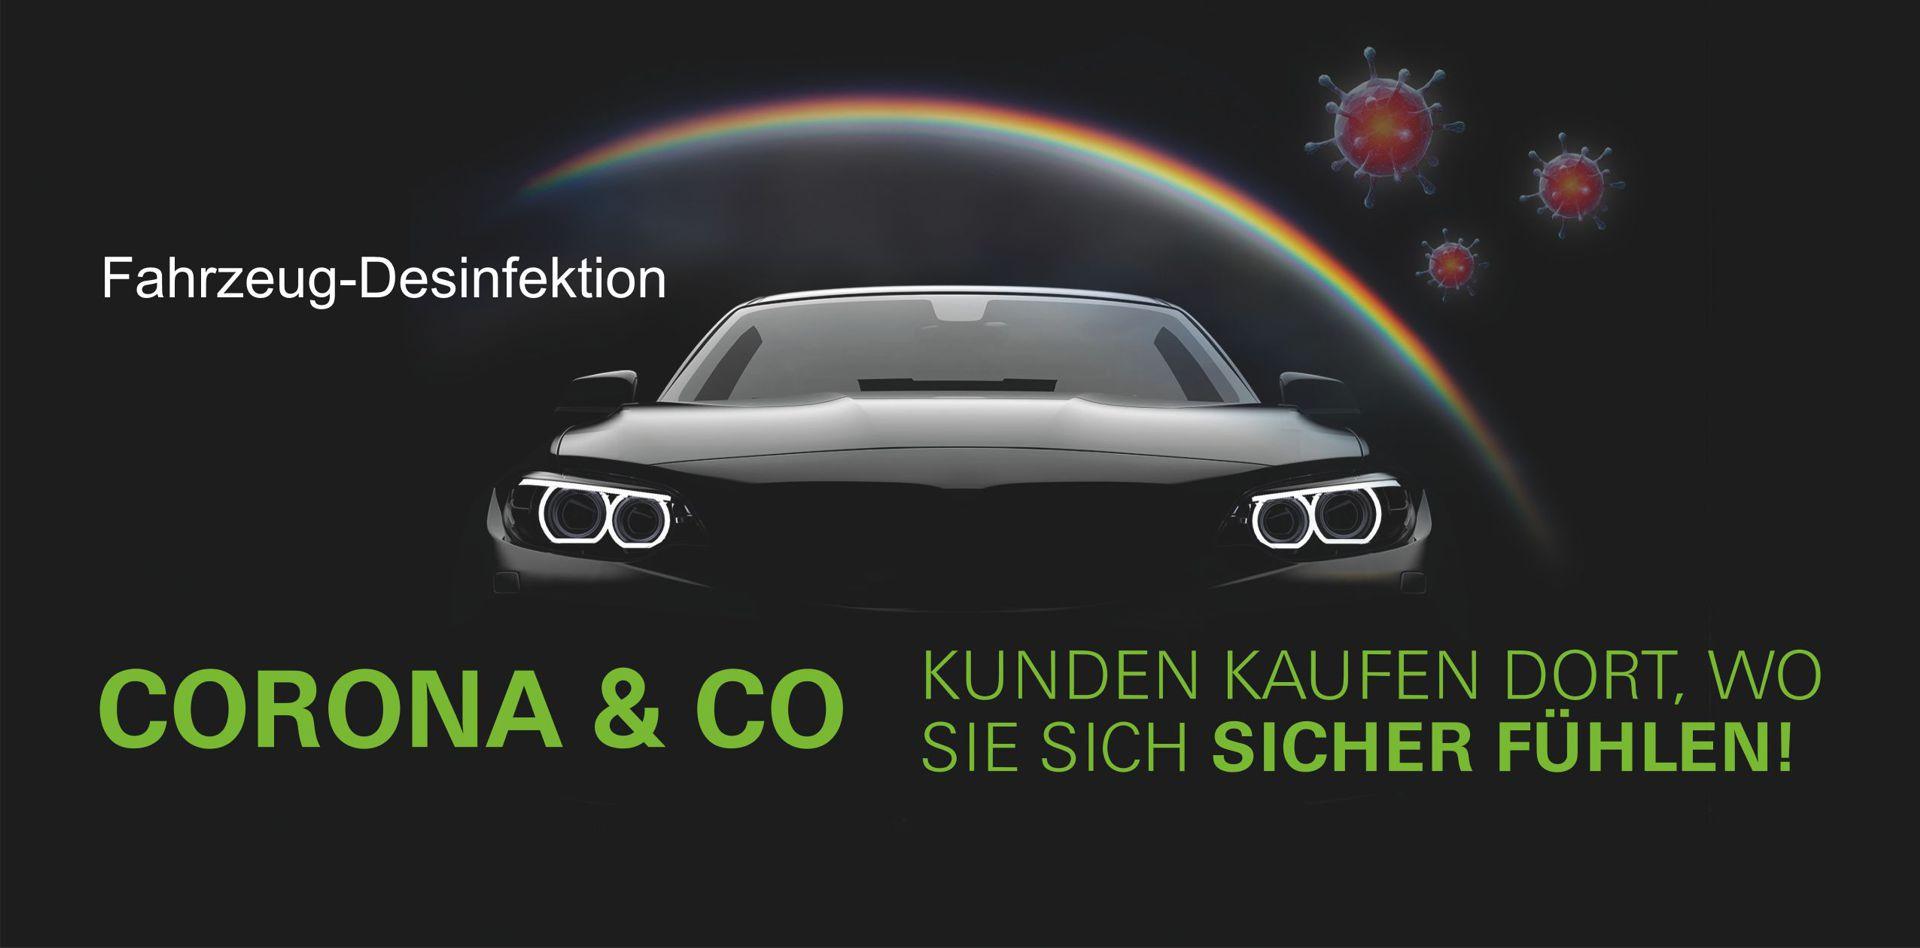 Auto wird durch Fahrzeug-Desinfektion gegen Viren, Bakterien und Pilzen geschützt.